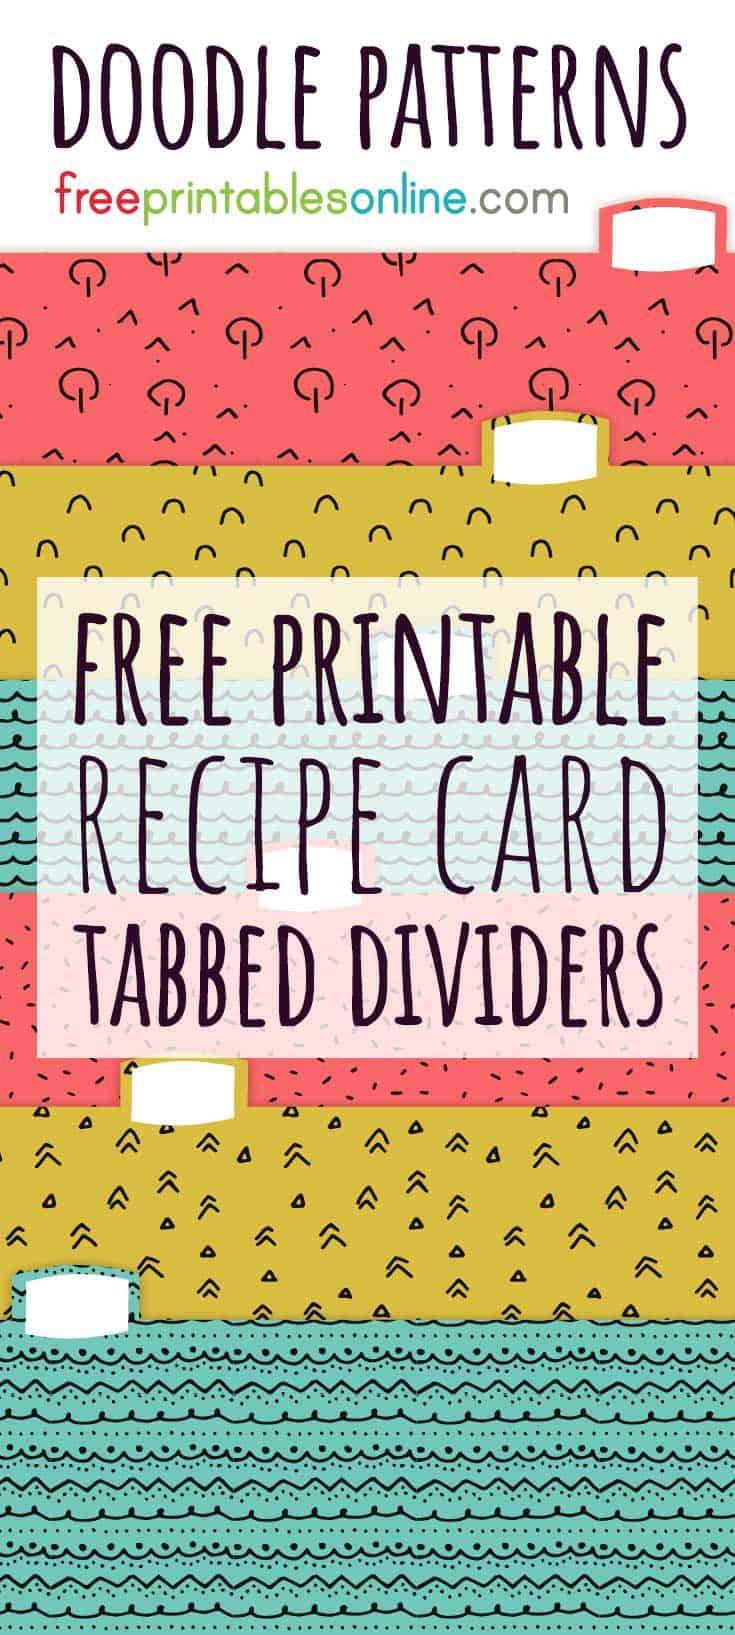 Recipe card box dividers